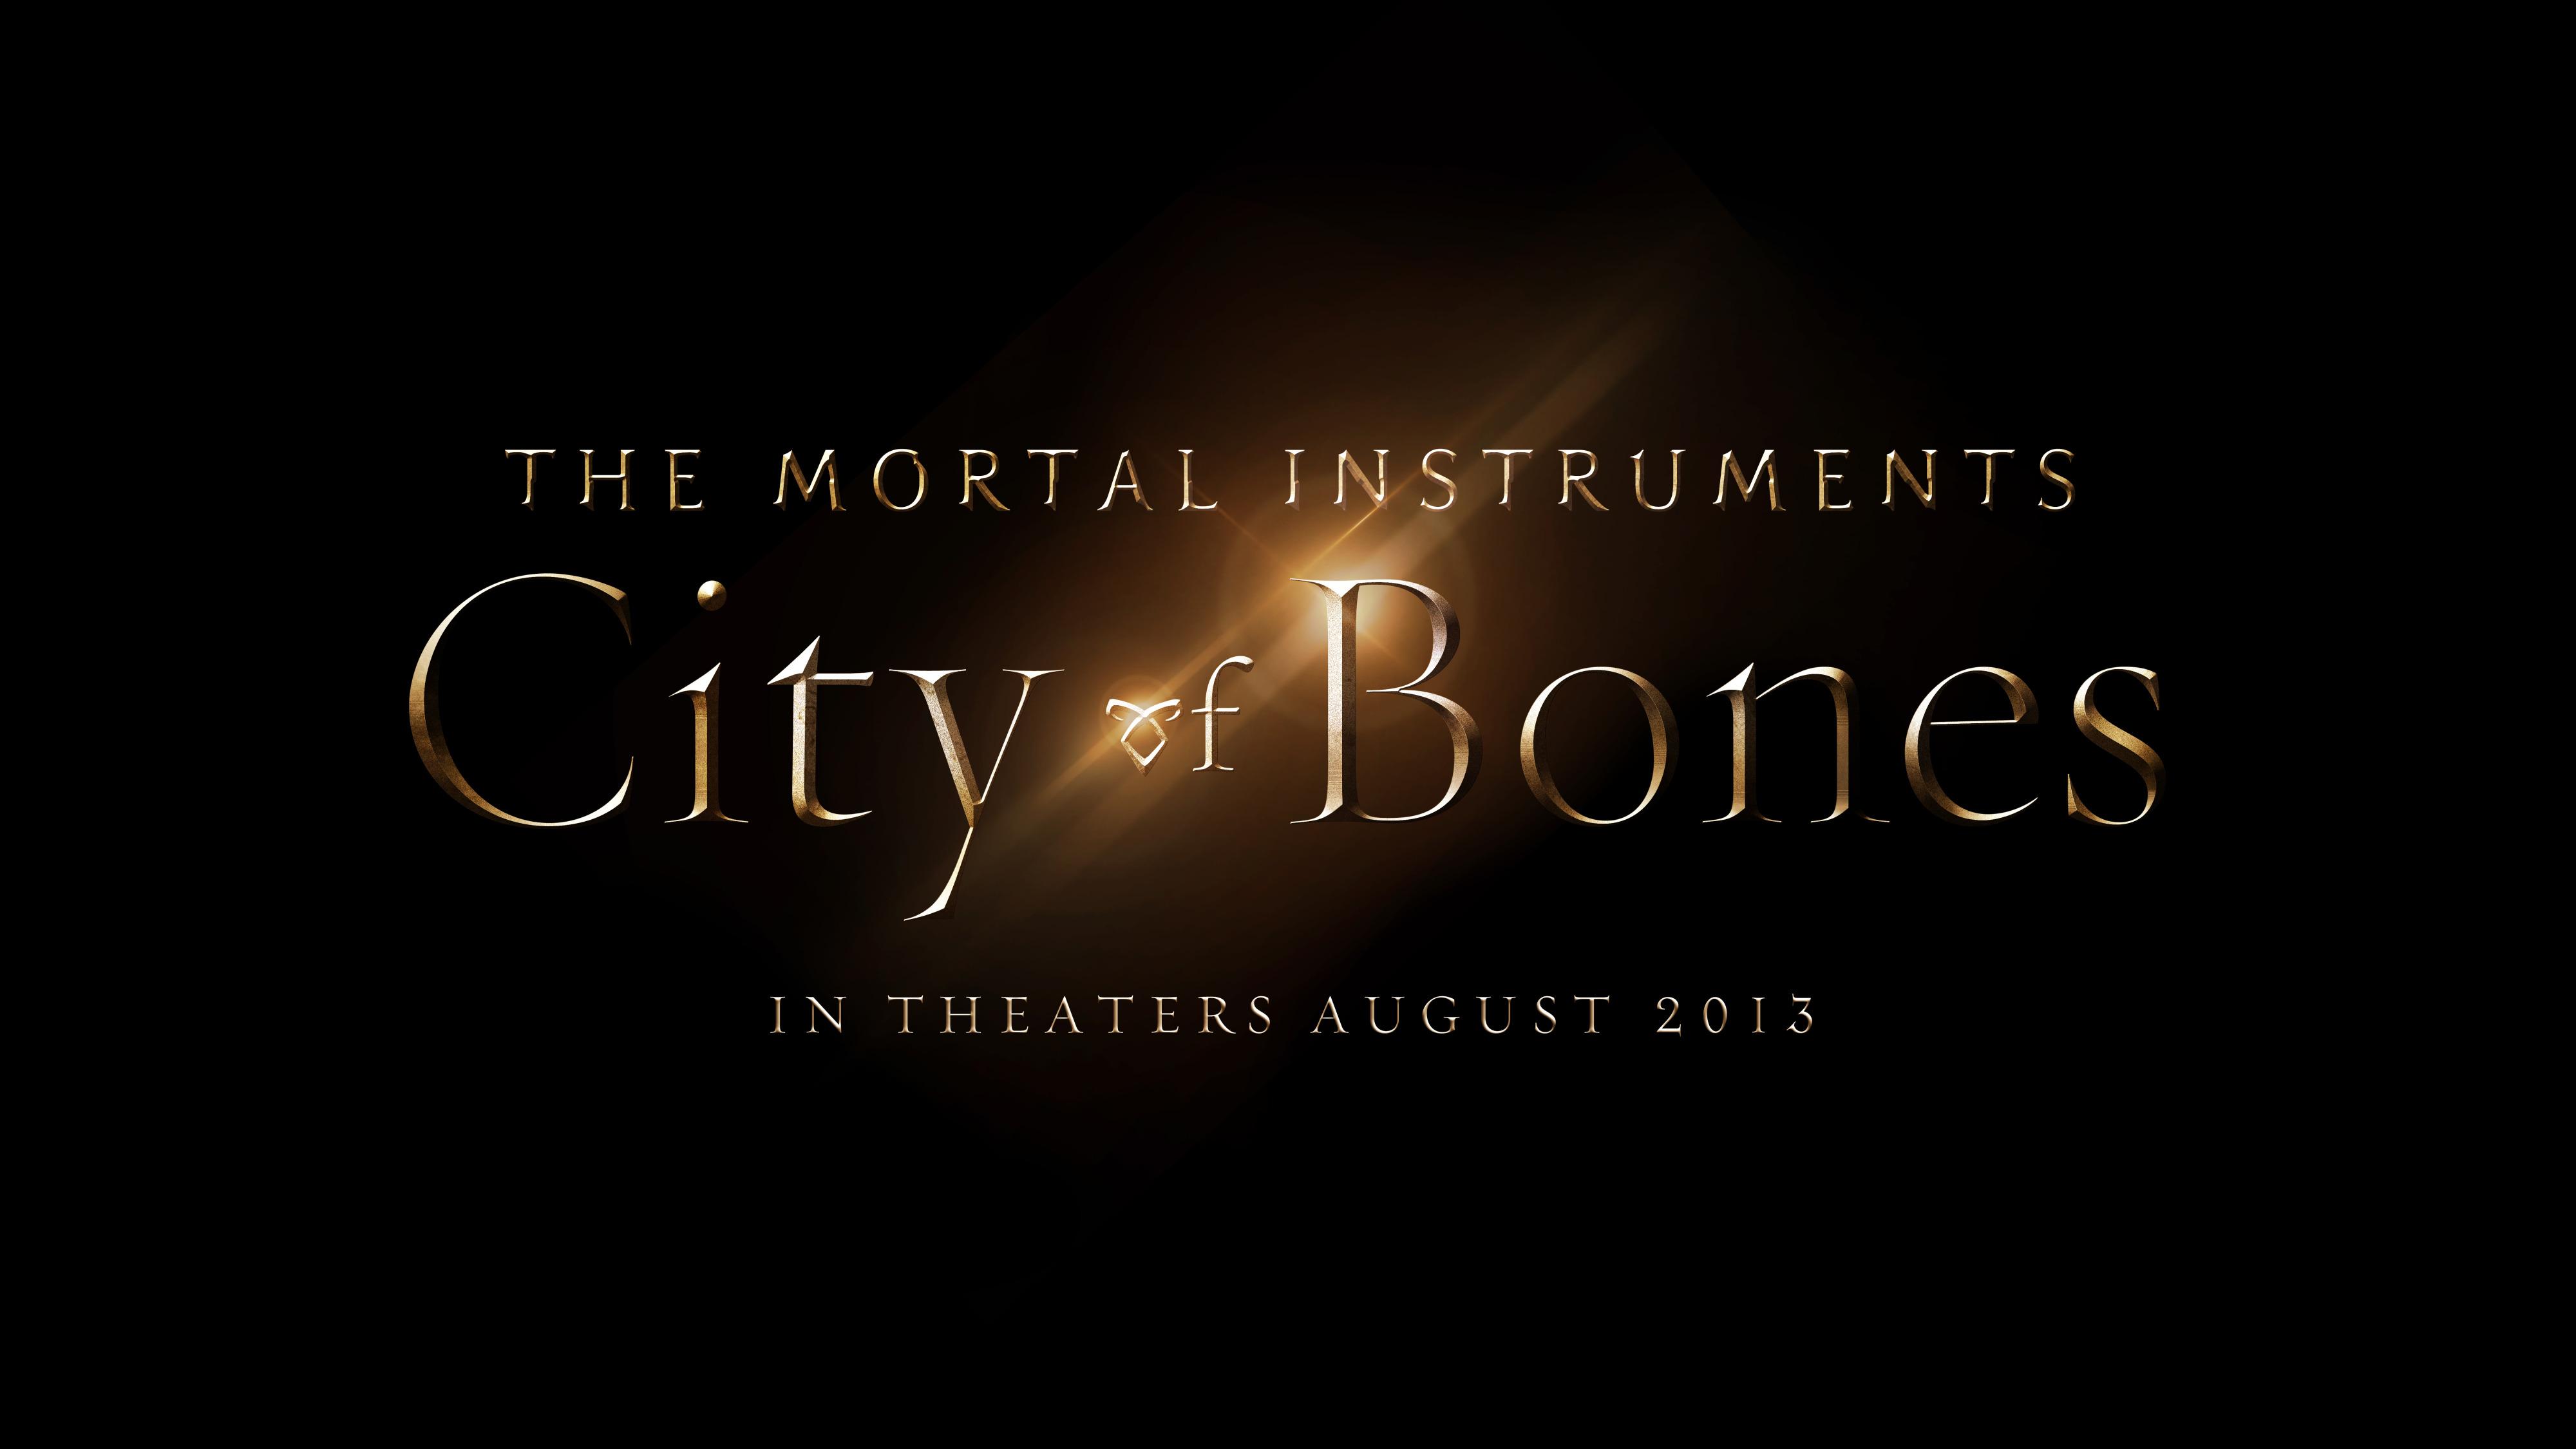 city of bones book movie - photo #14